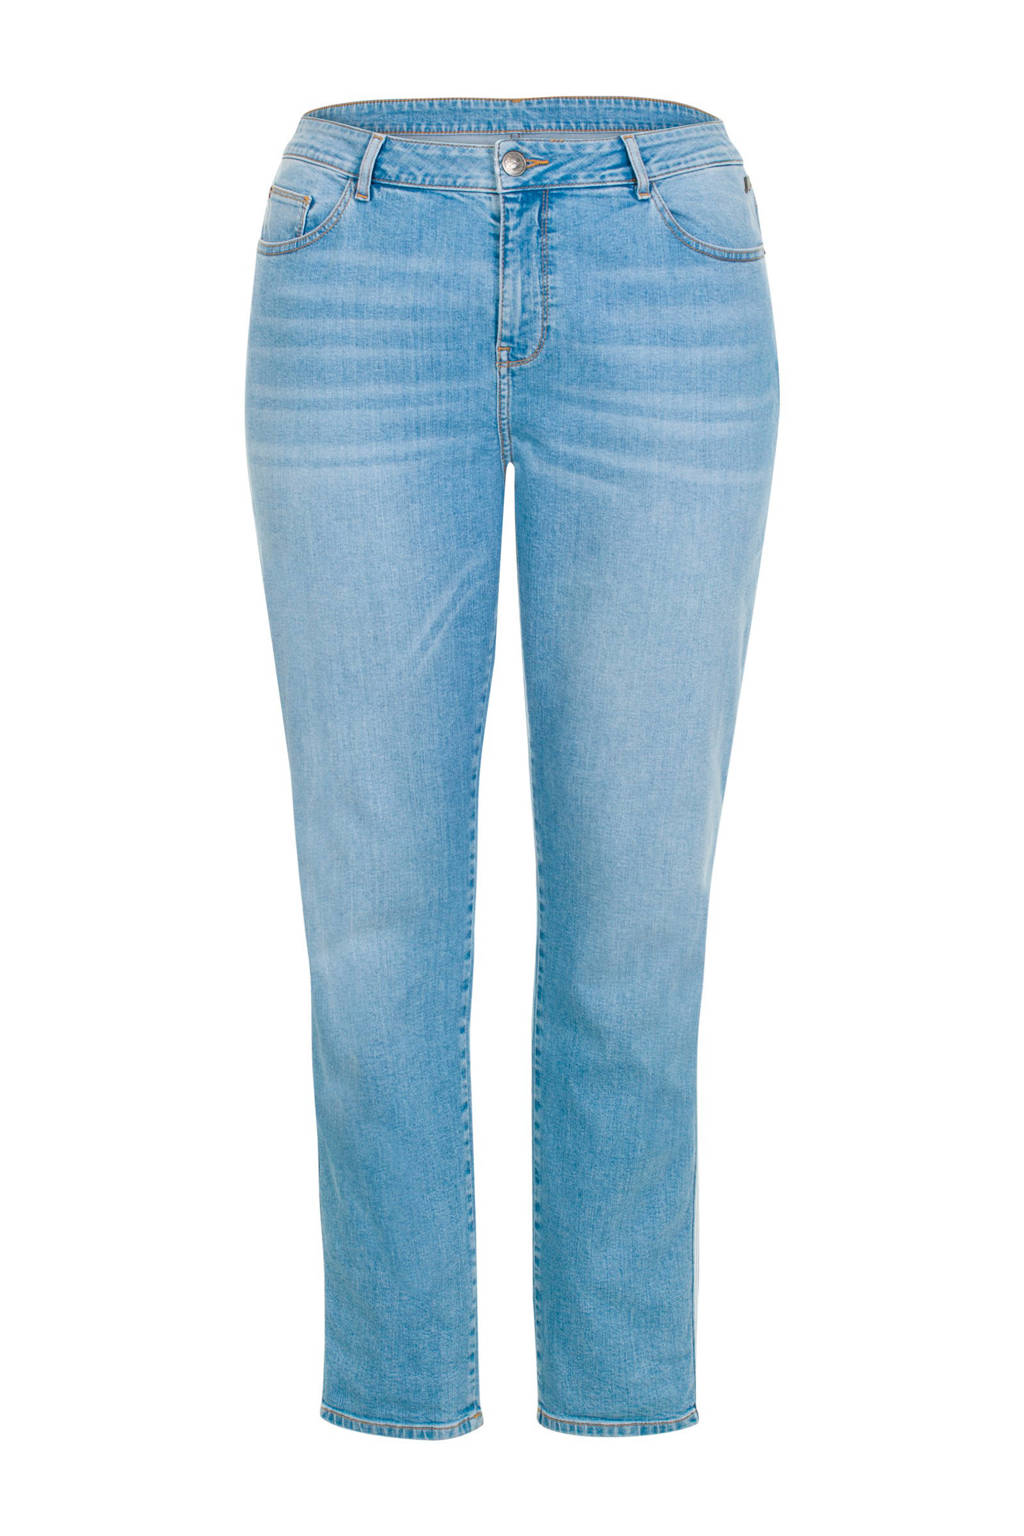 Miss Etam Plus slim fit jeans met zijstreep, Licght denim